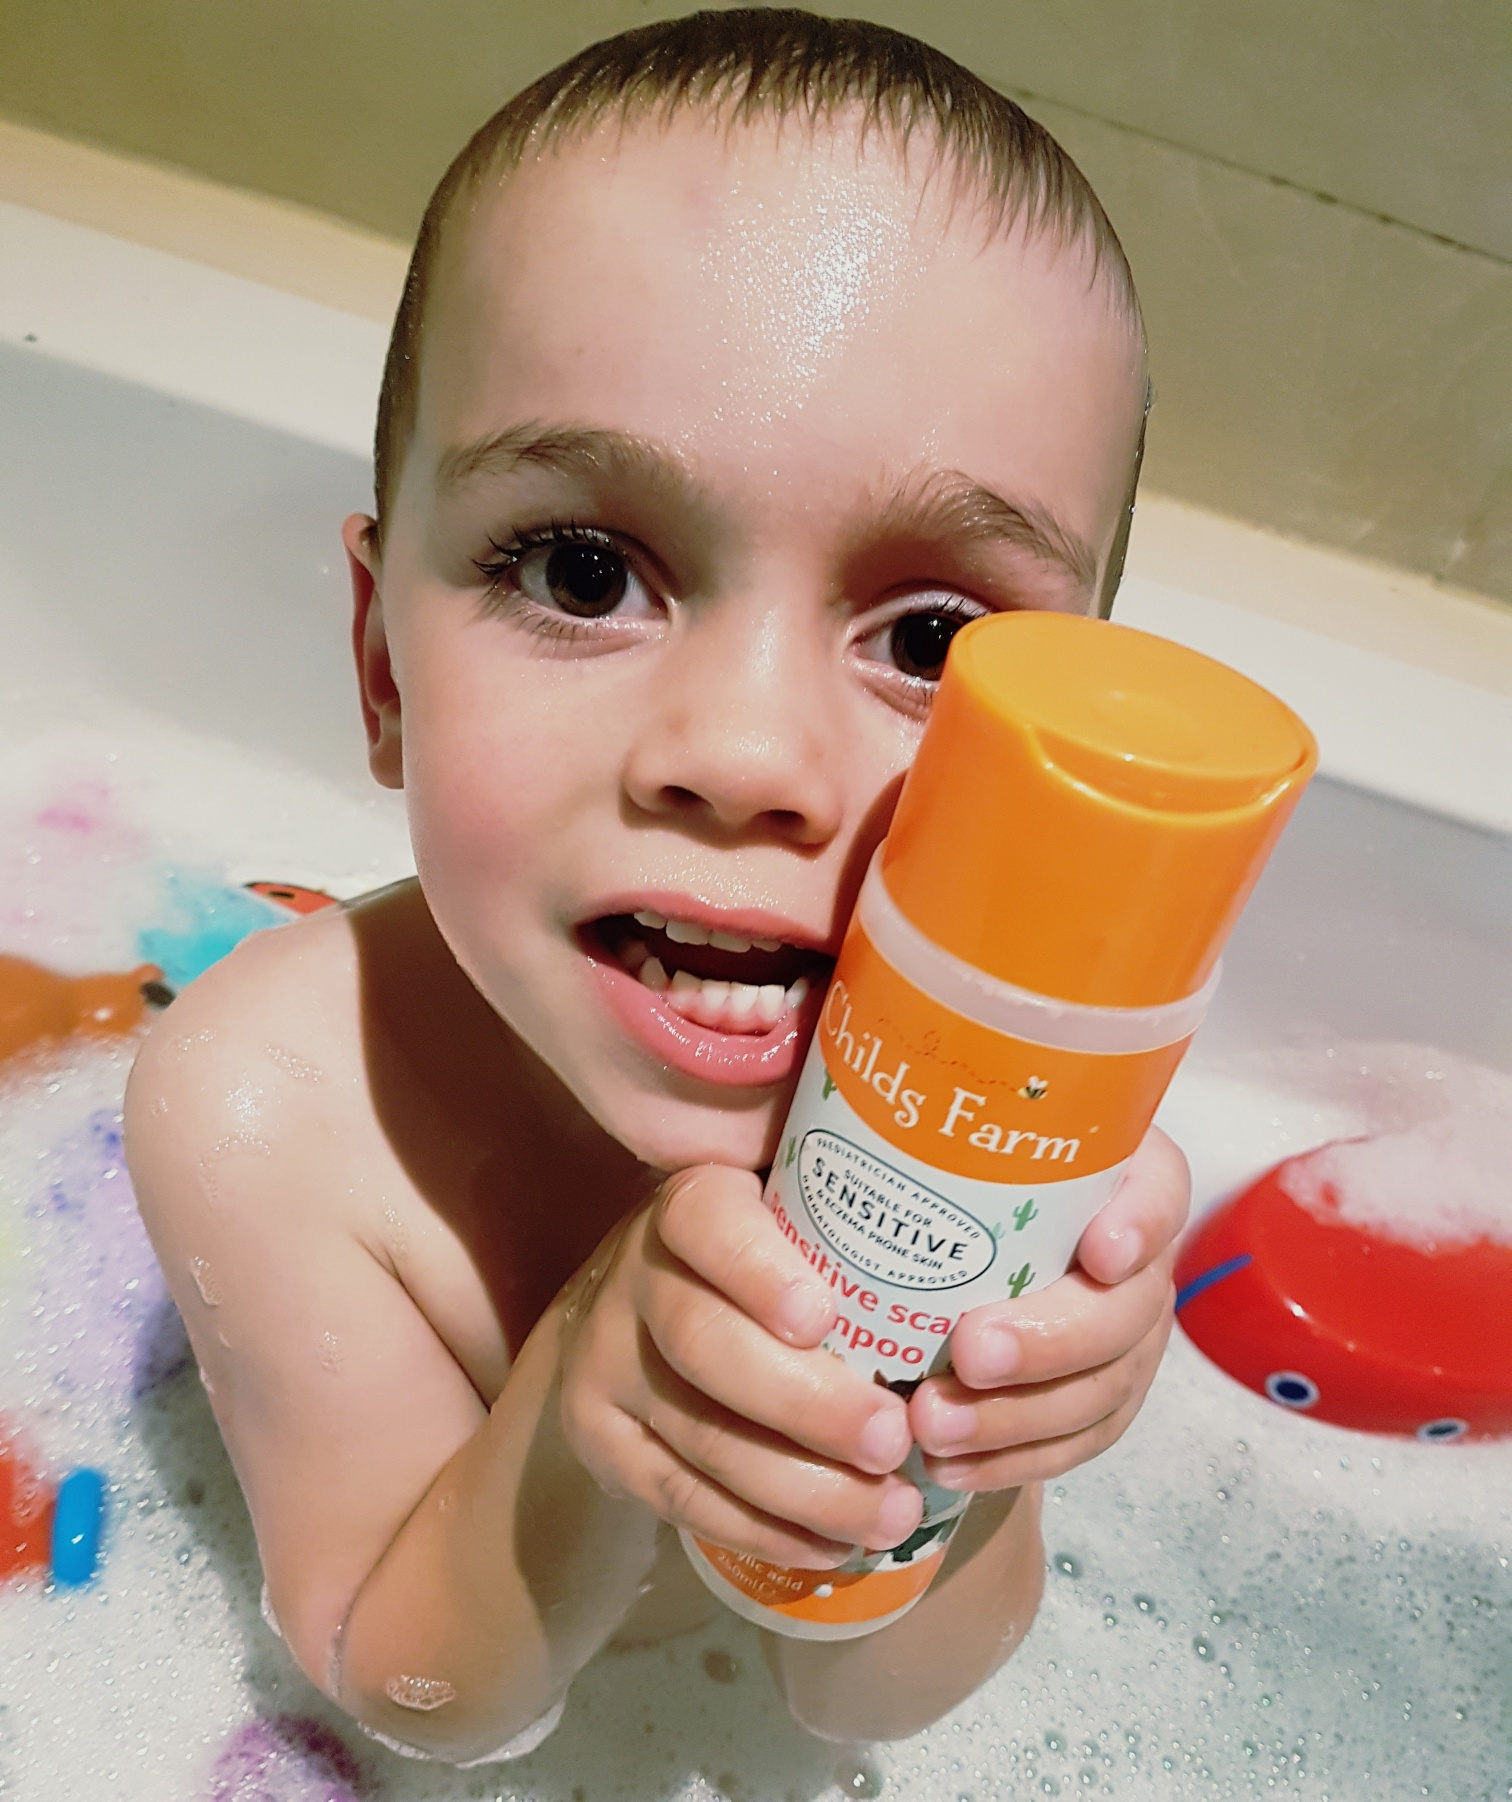 national eczema week